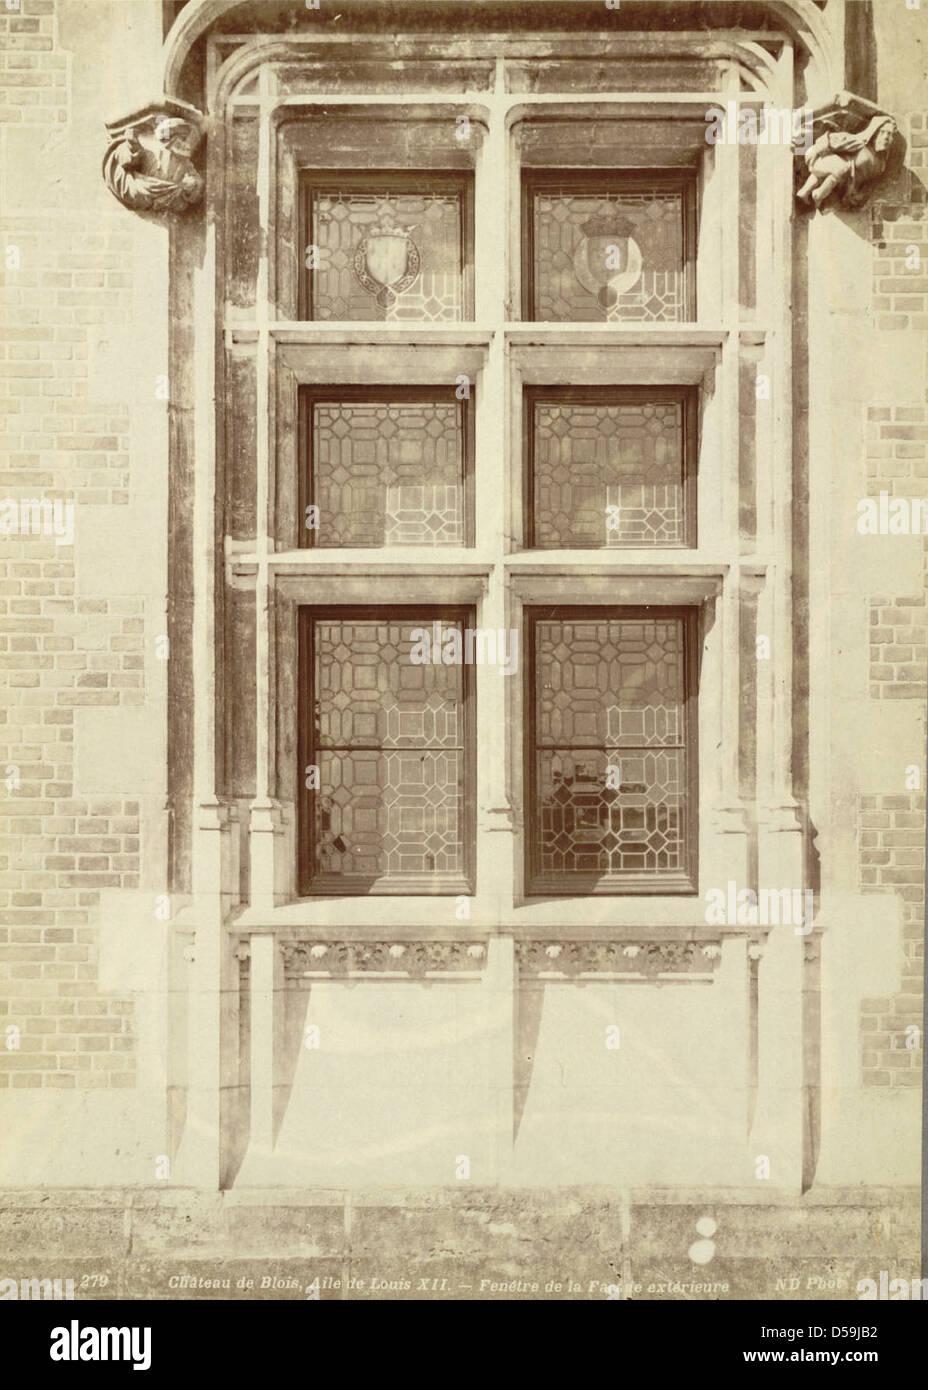 Château de Blois, Window (Louis XII Wing) Stock Photo